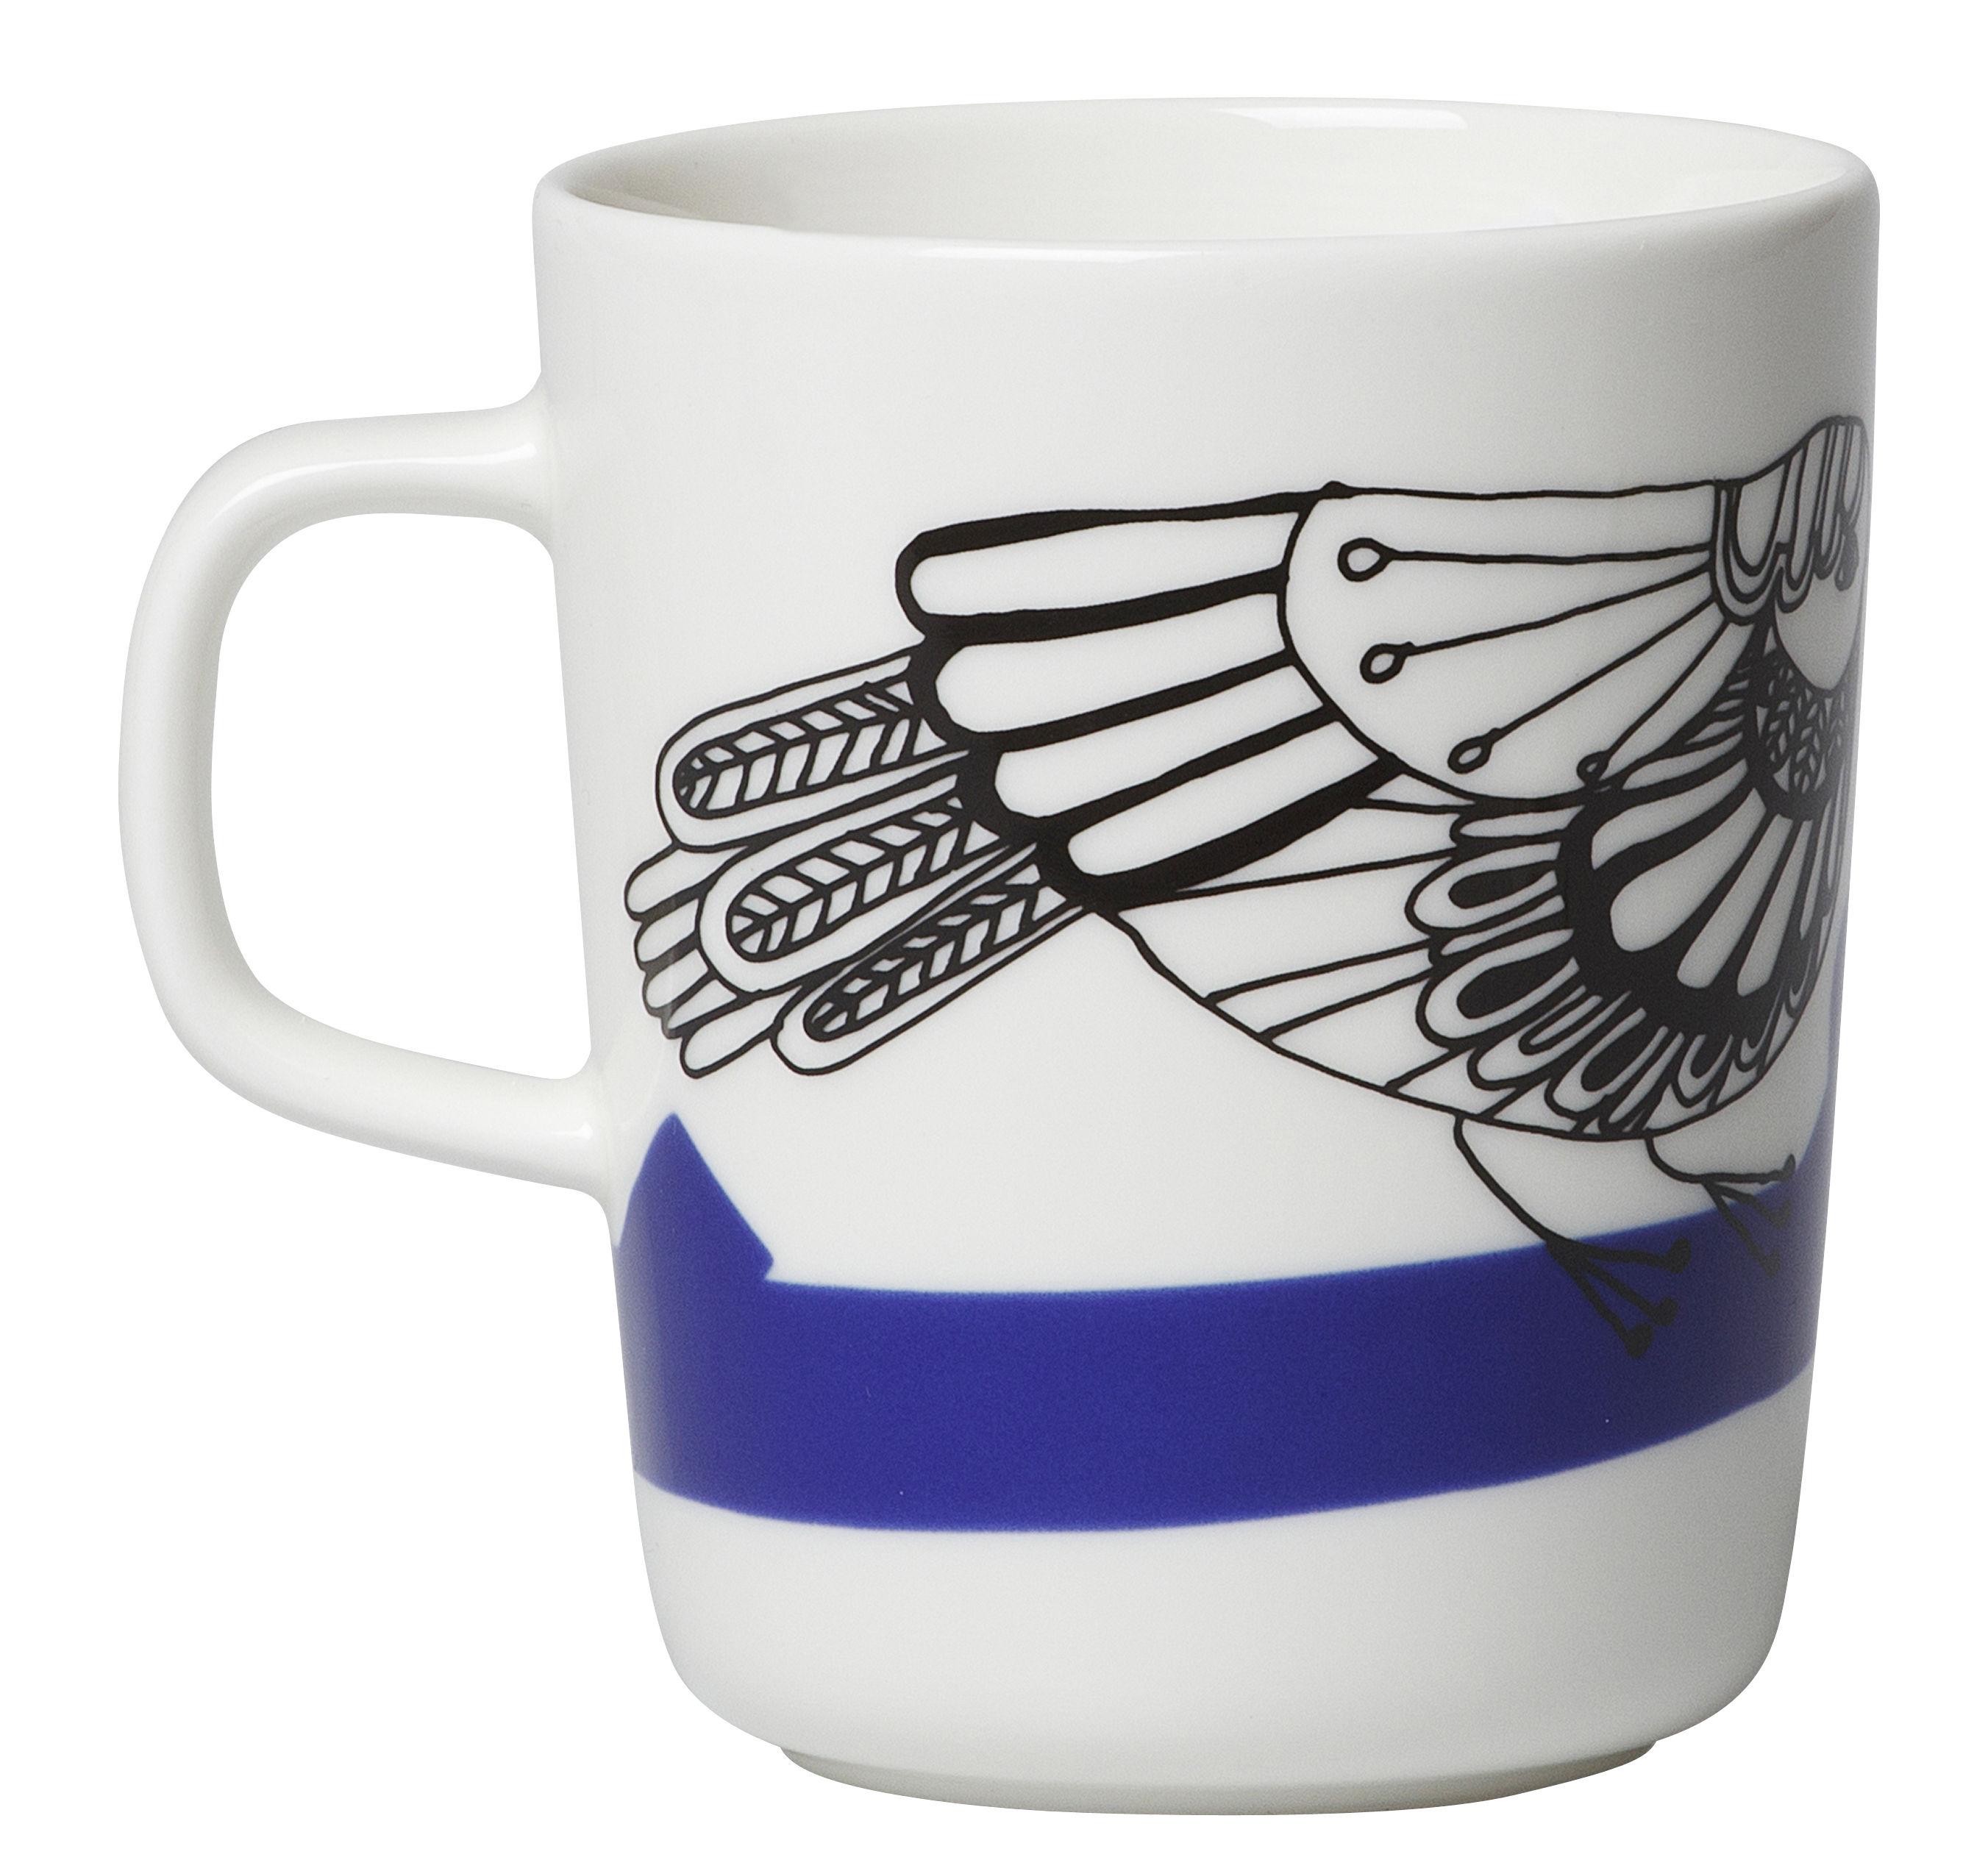 mug pakkanen 25 cl pakkanen blanc bleu et rouge marimekko. Black Bedroom Furniture Sets. Home Design Ideas